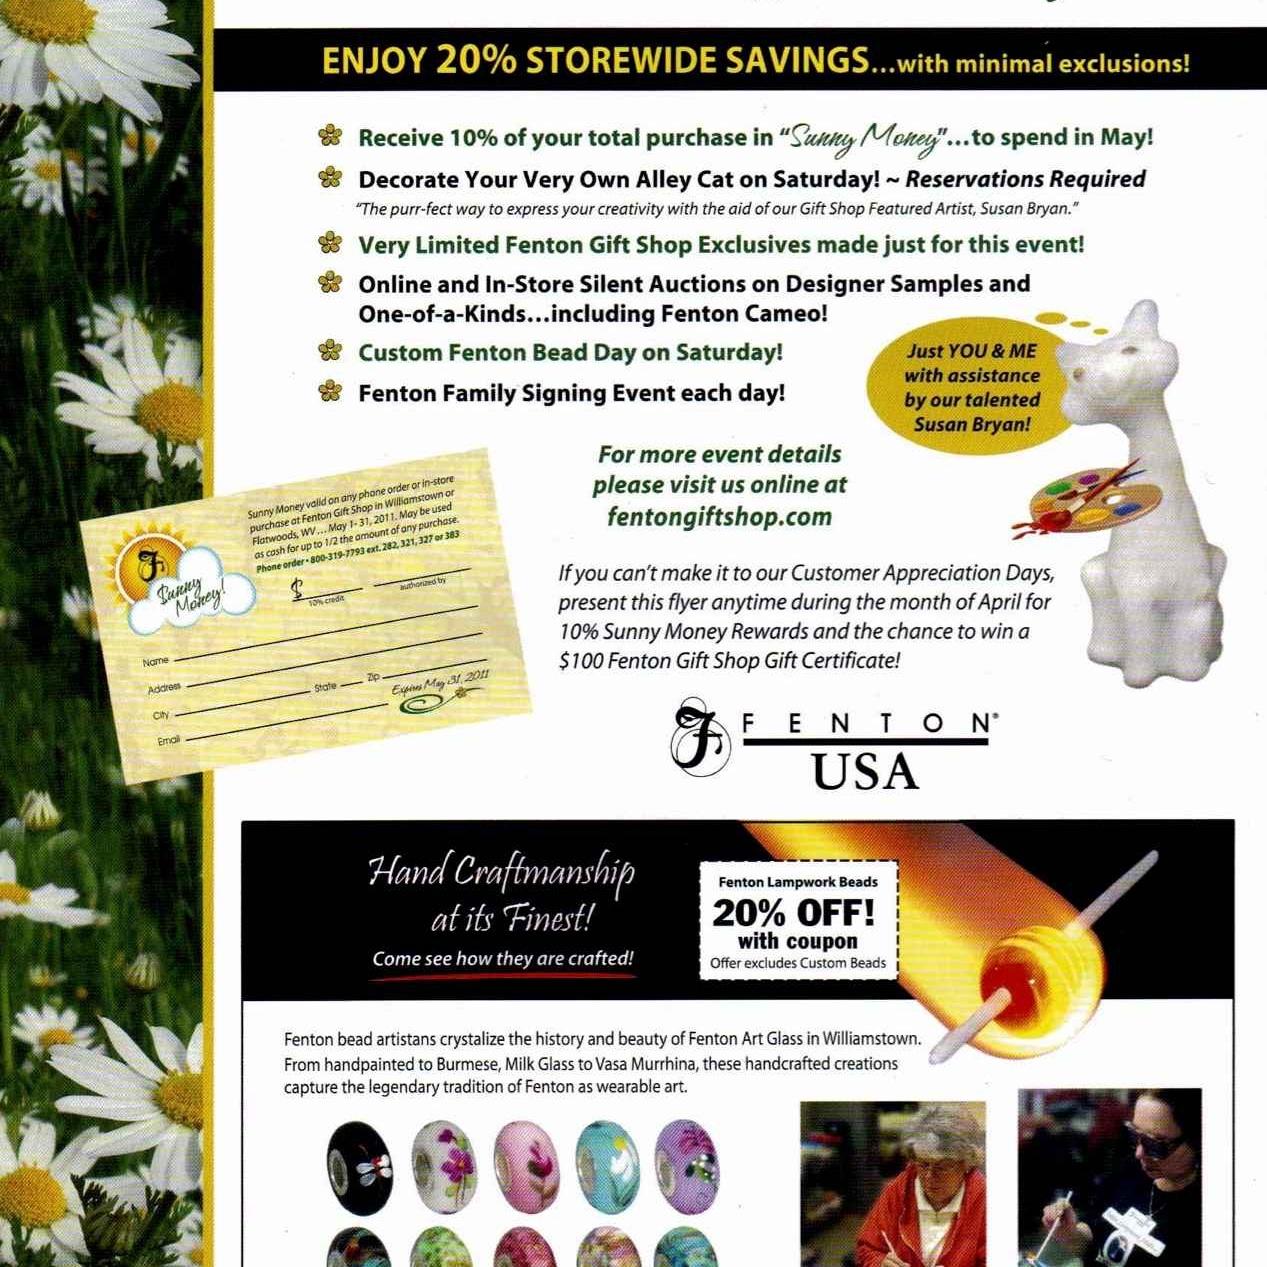 2011 Customer Appr. Days Flyer